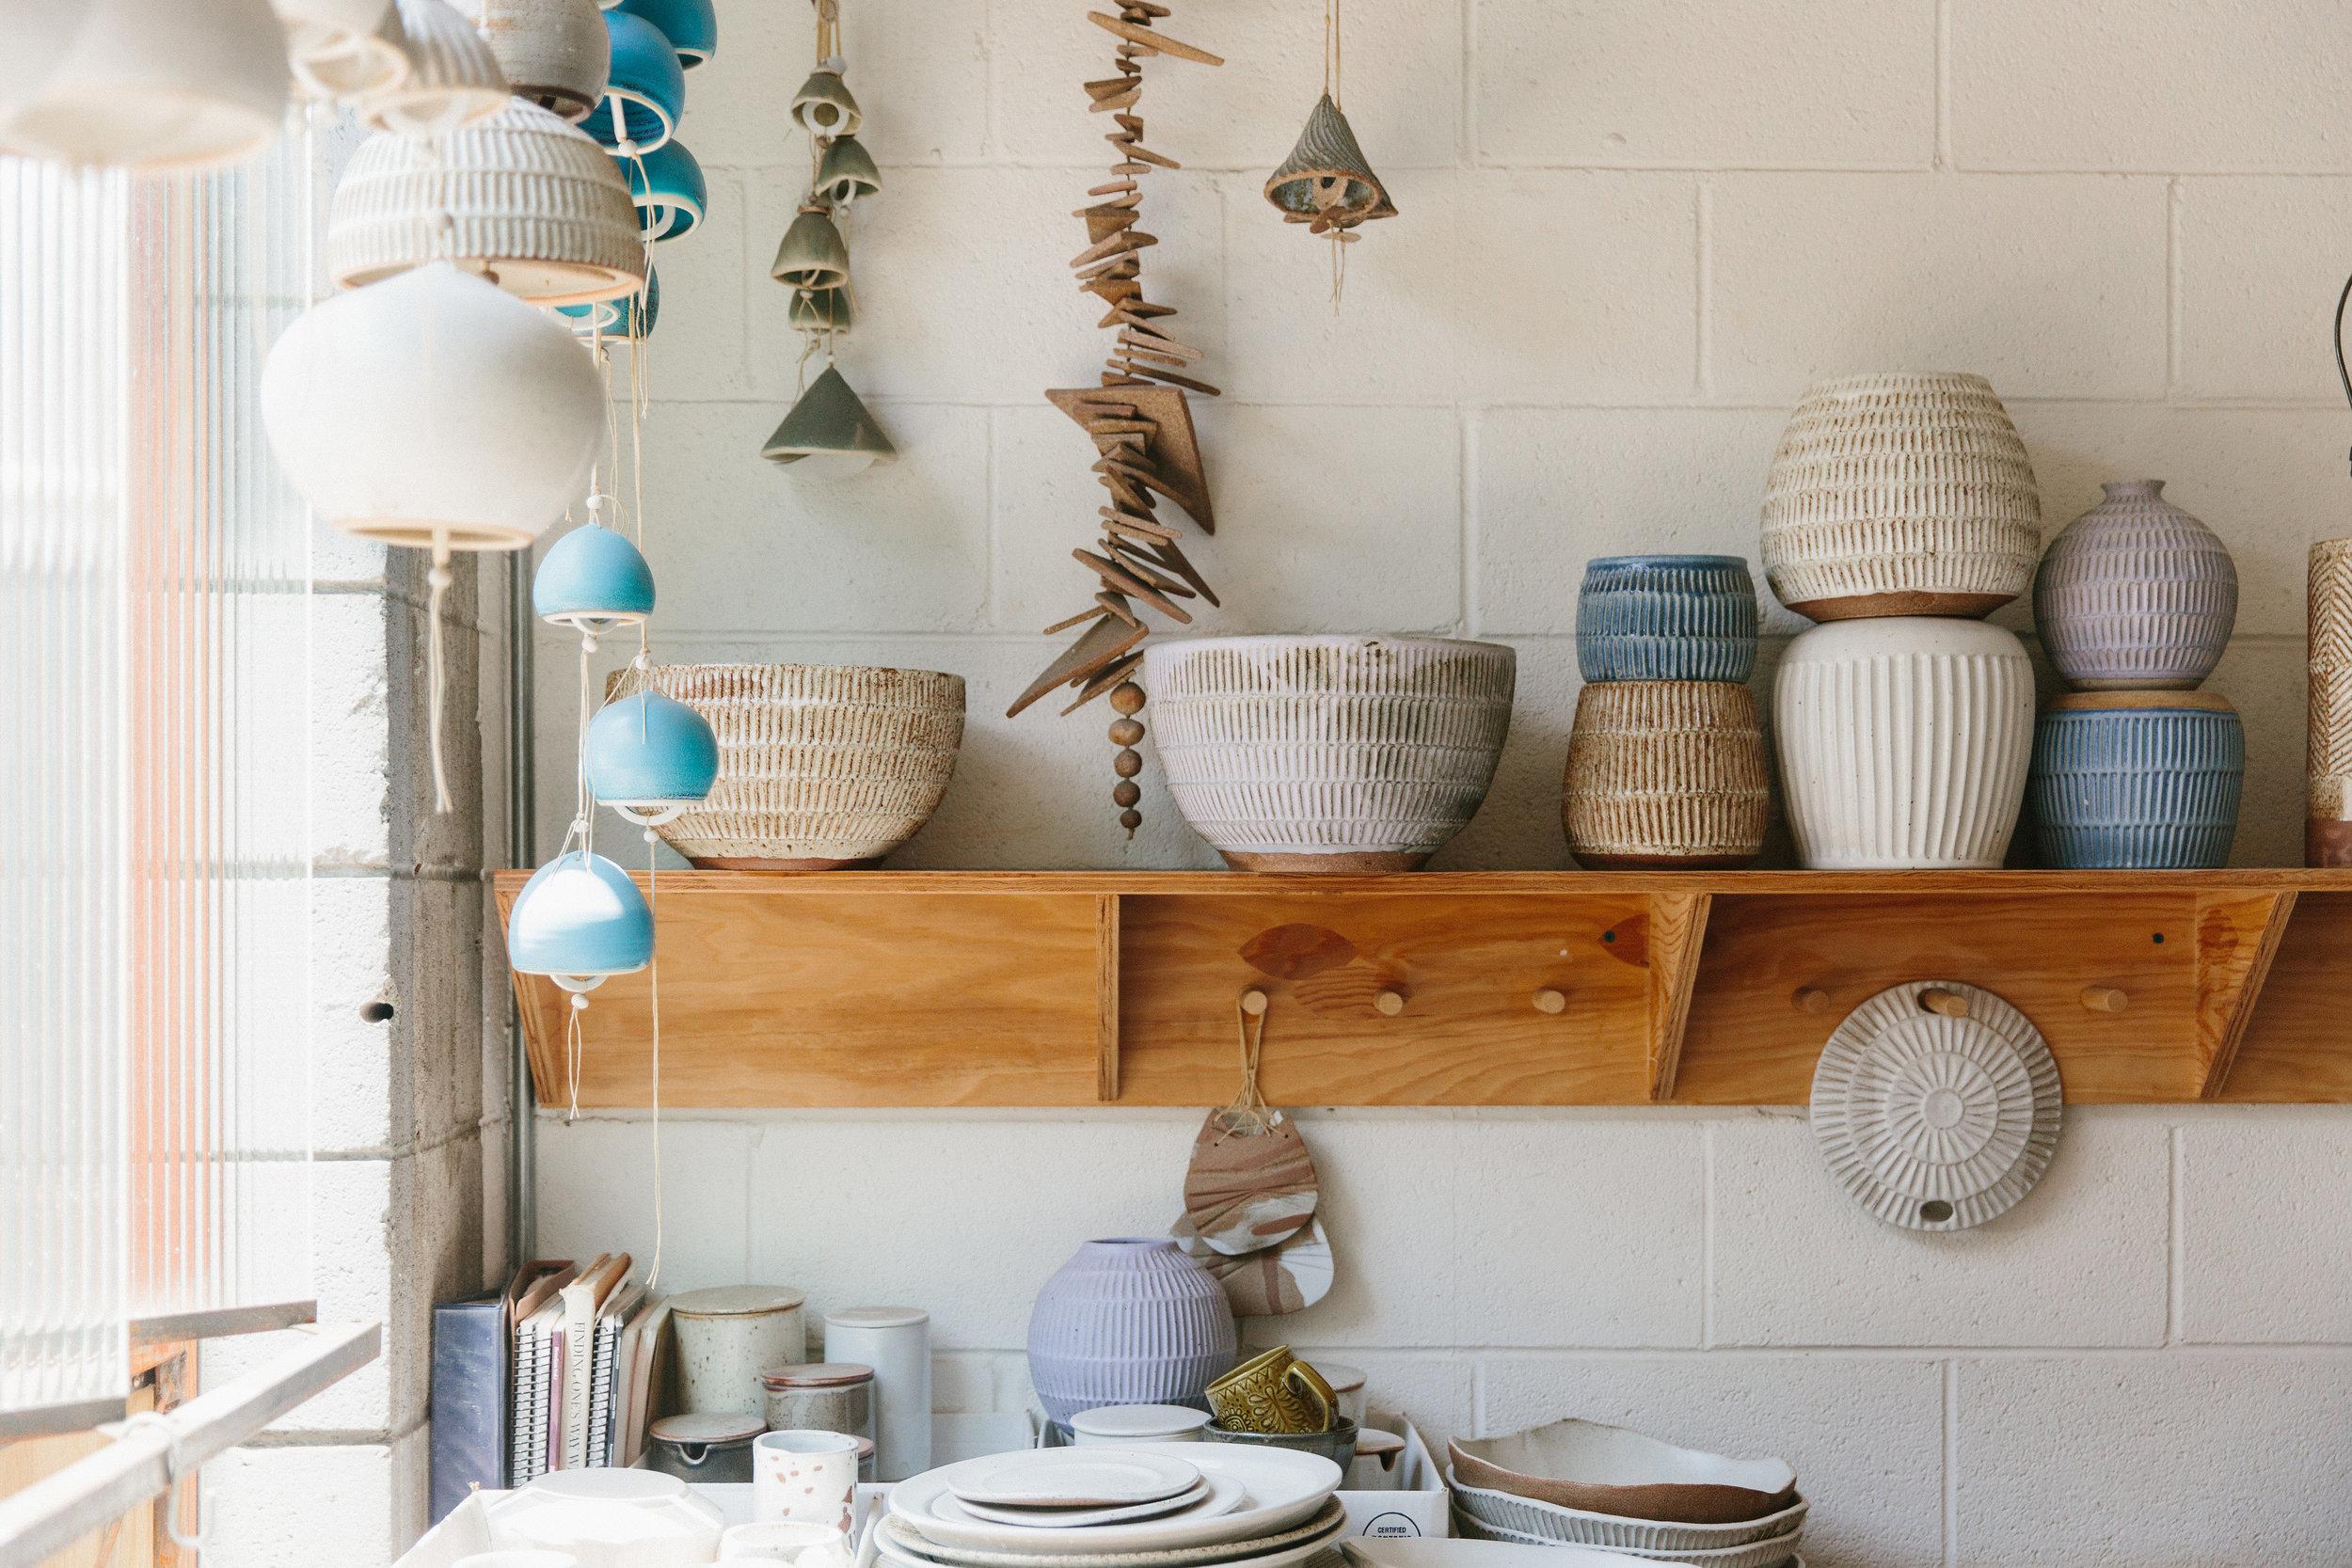 mt-washington-pottery_jenni-kayne_nicki-sebastian-photography-53.jpg